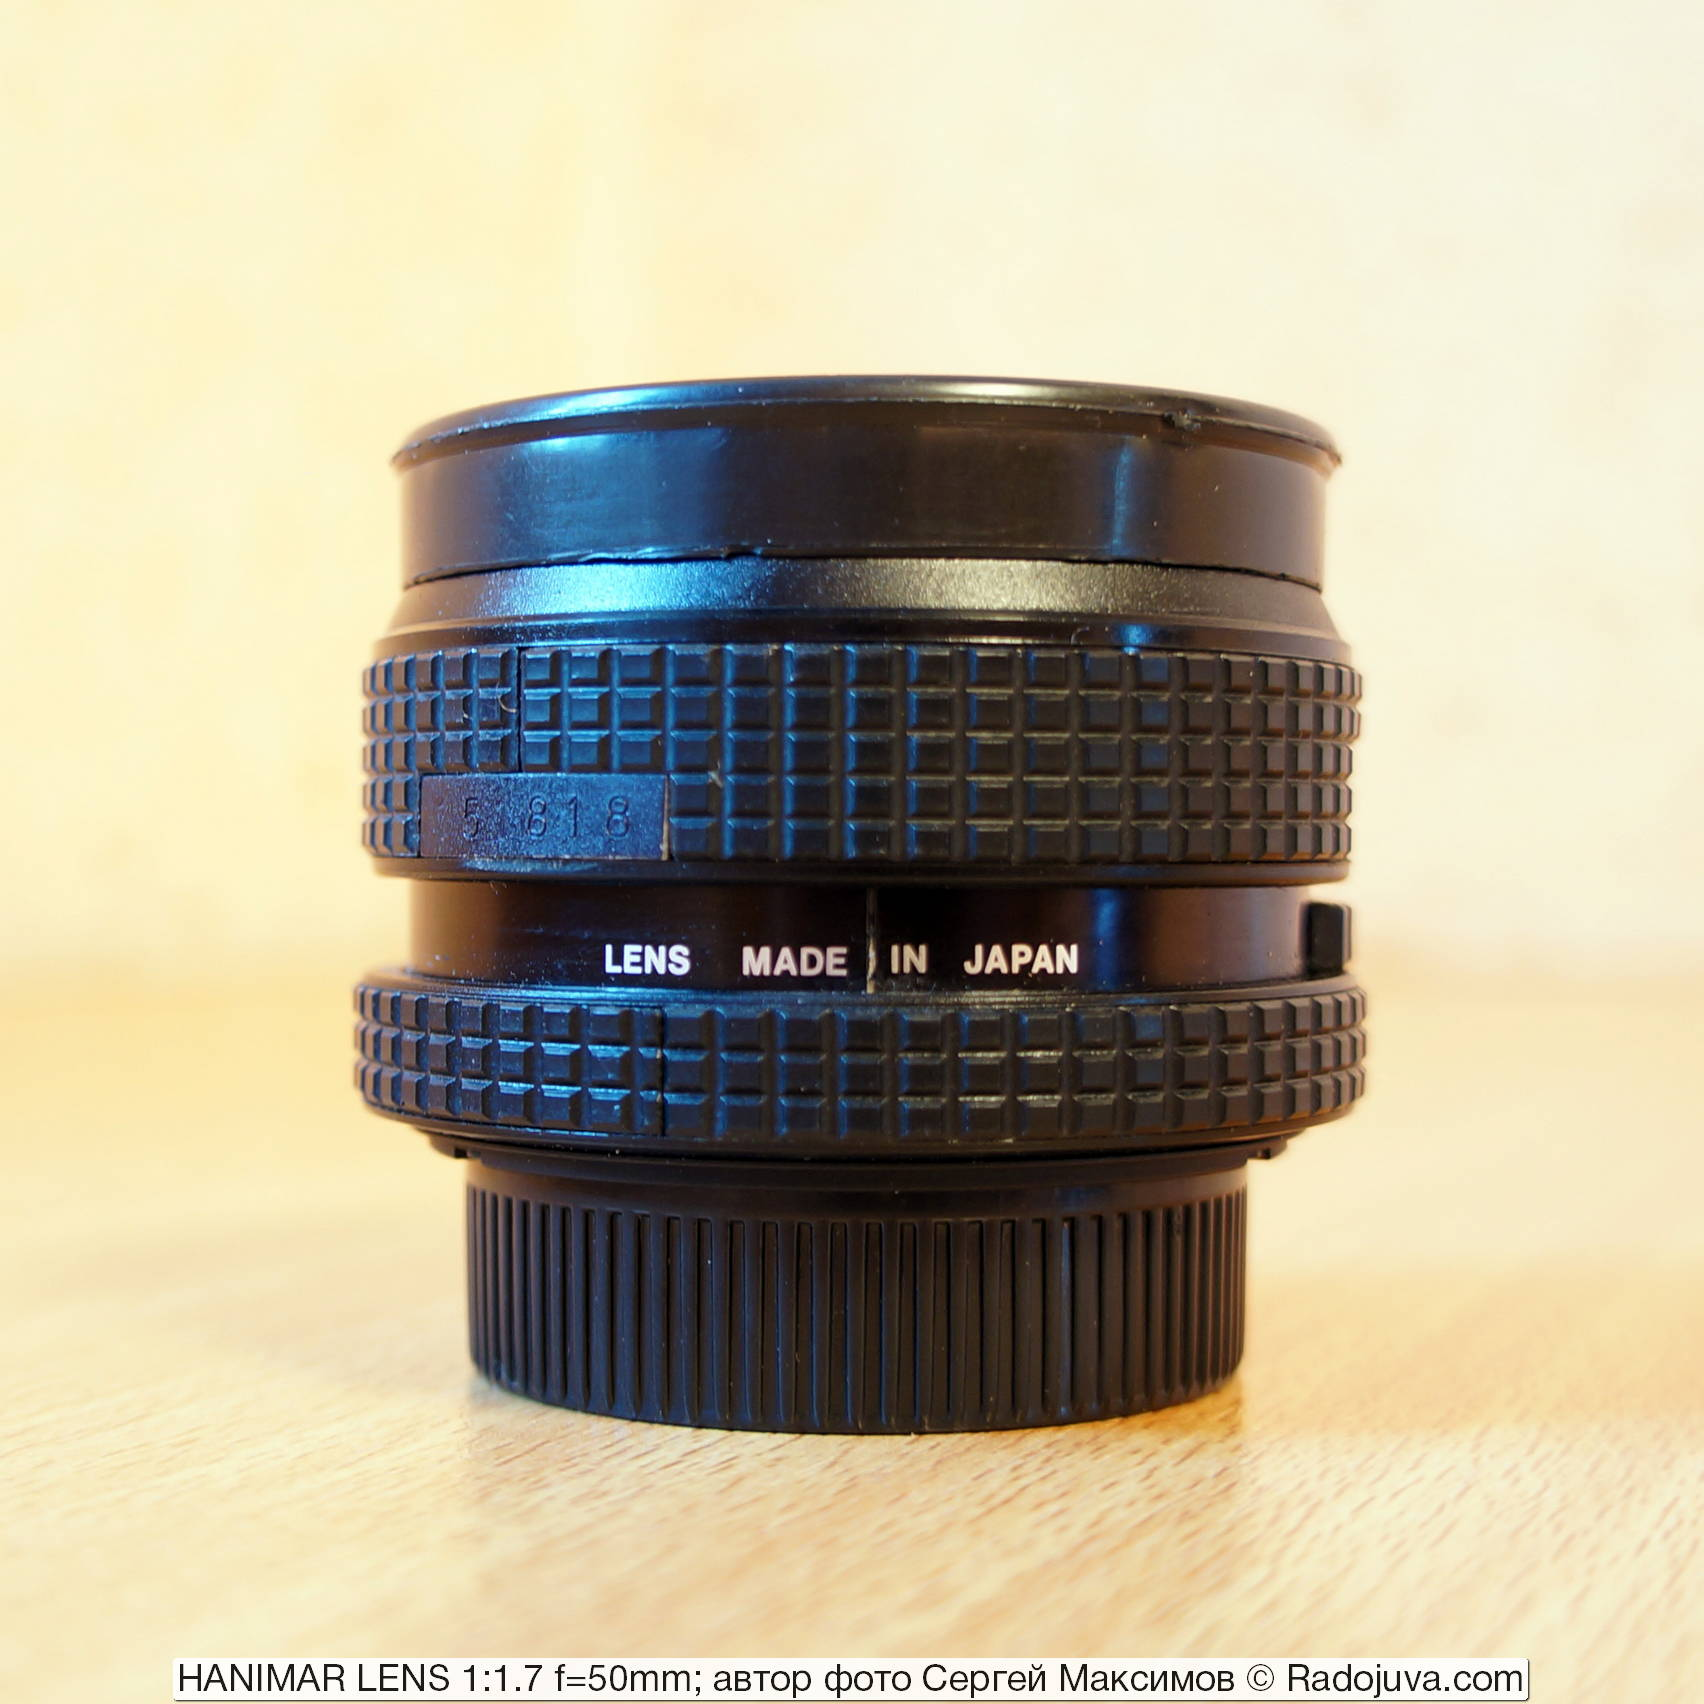 HANIMAR LENS 1:1.7 f=50mm